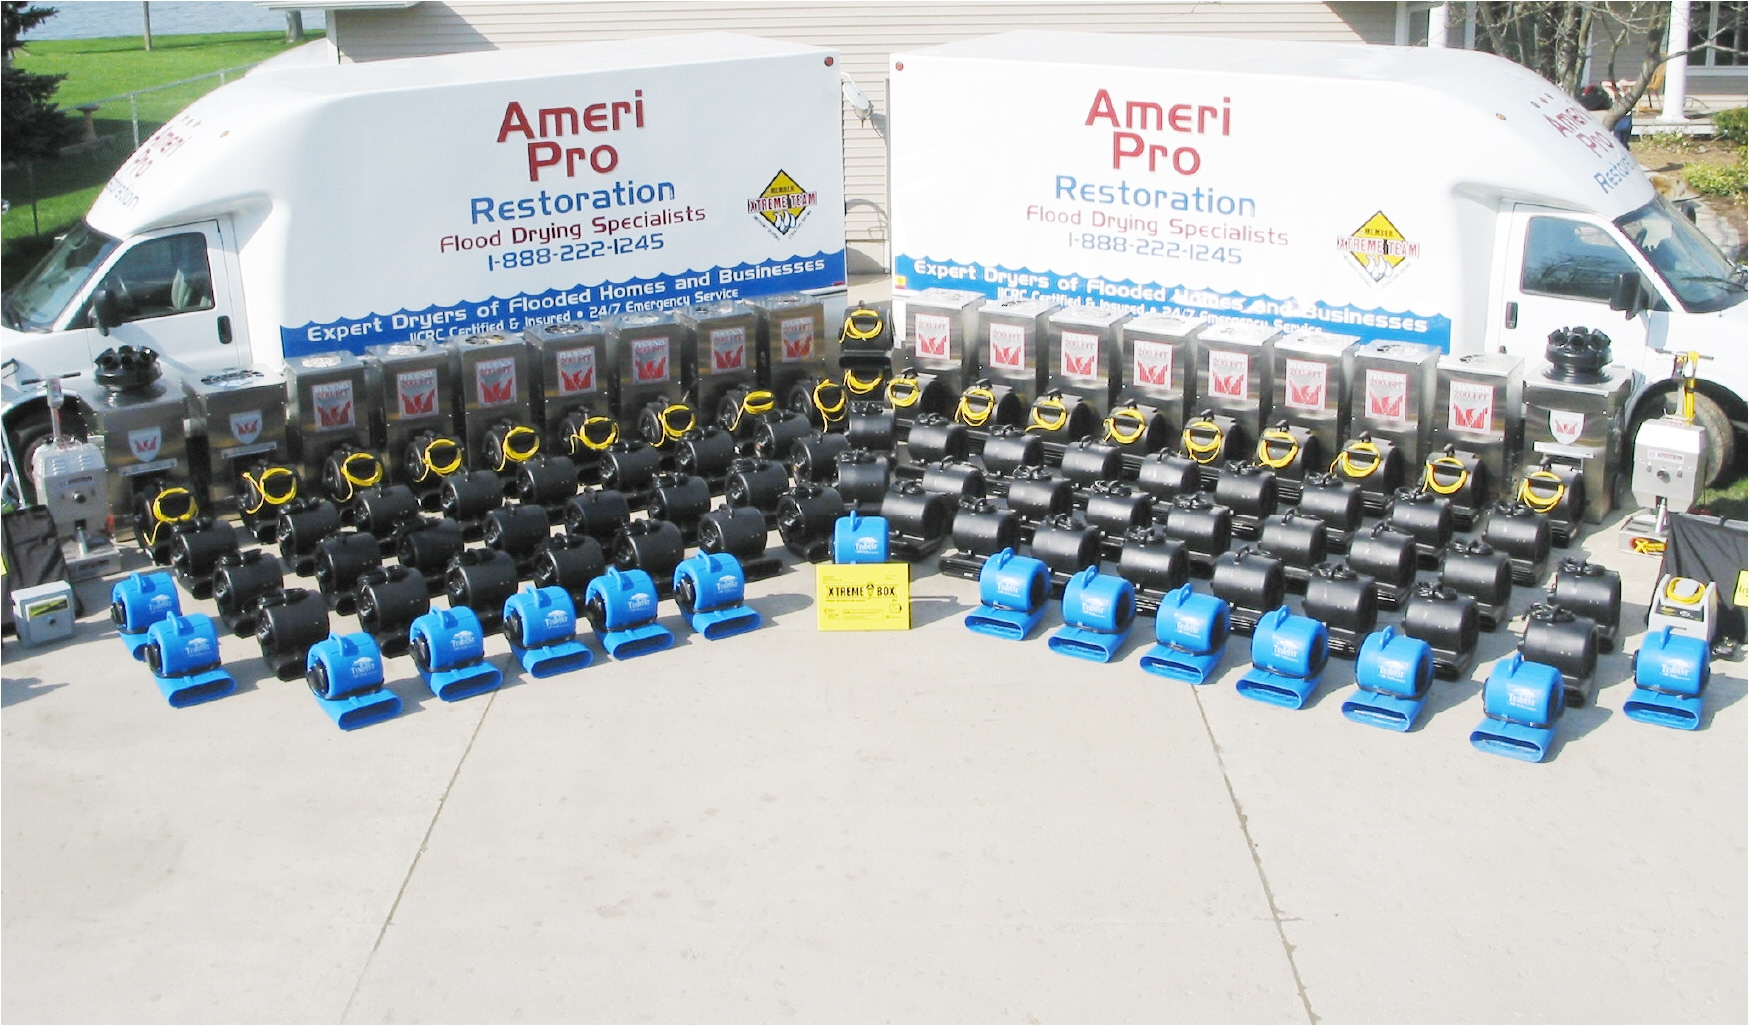 Ameri pro restoration llc in grand ledge mi 48837 for Pro equipement restauration